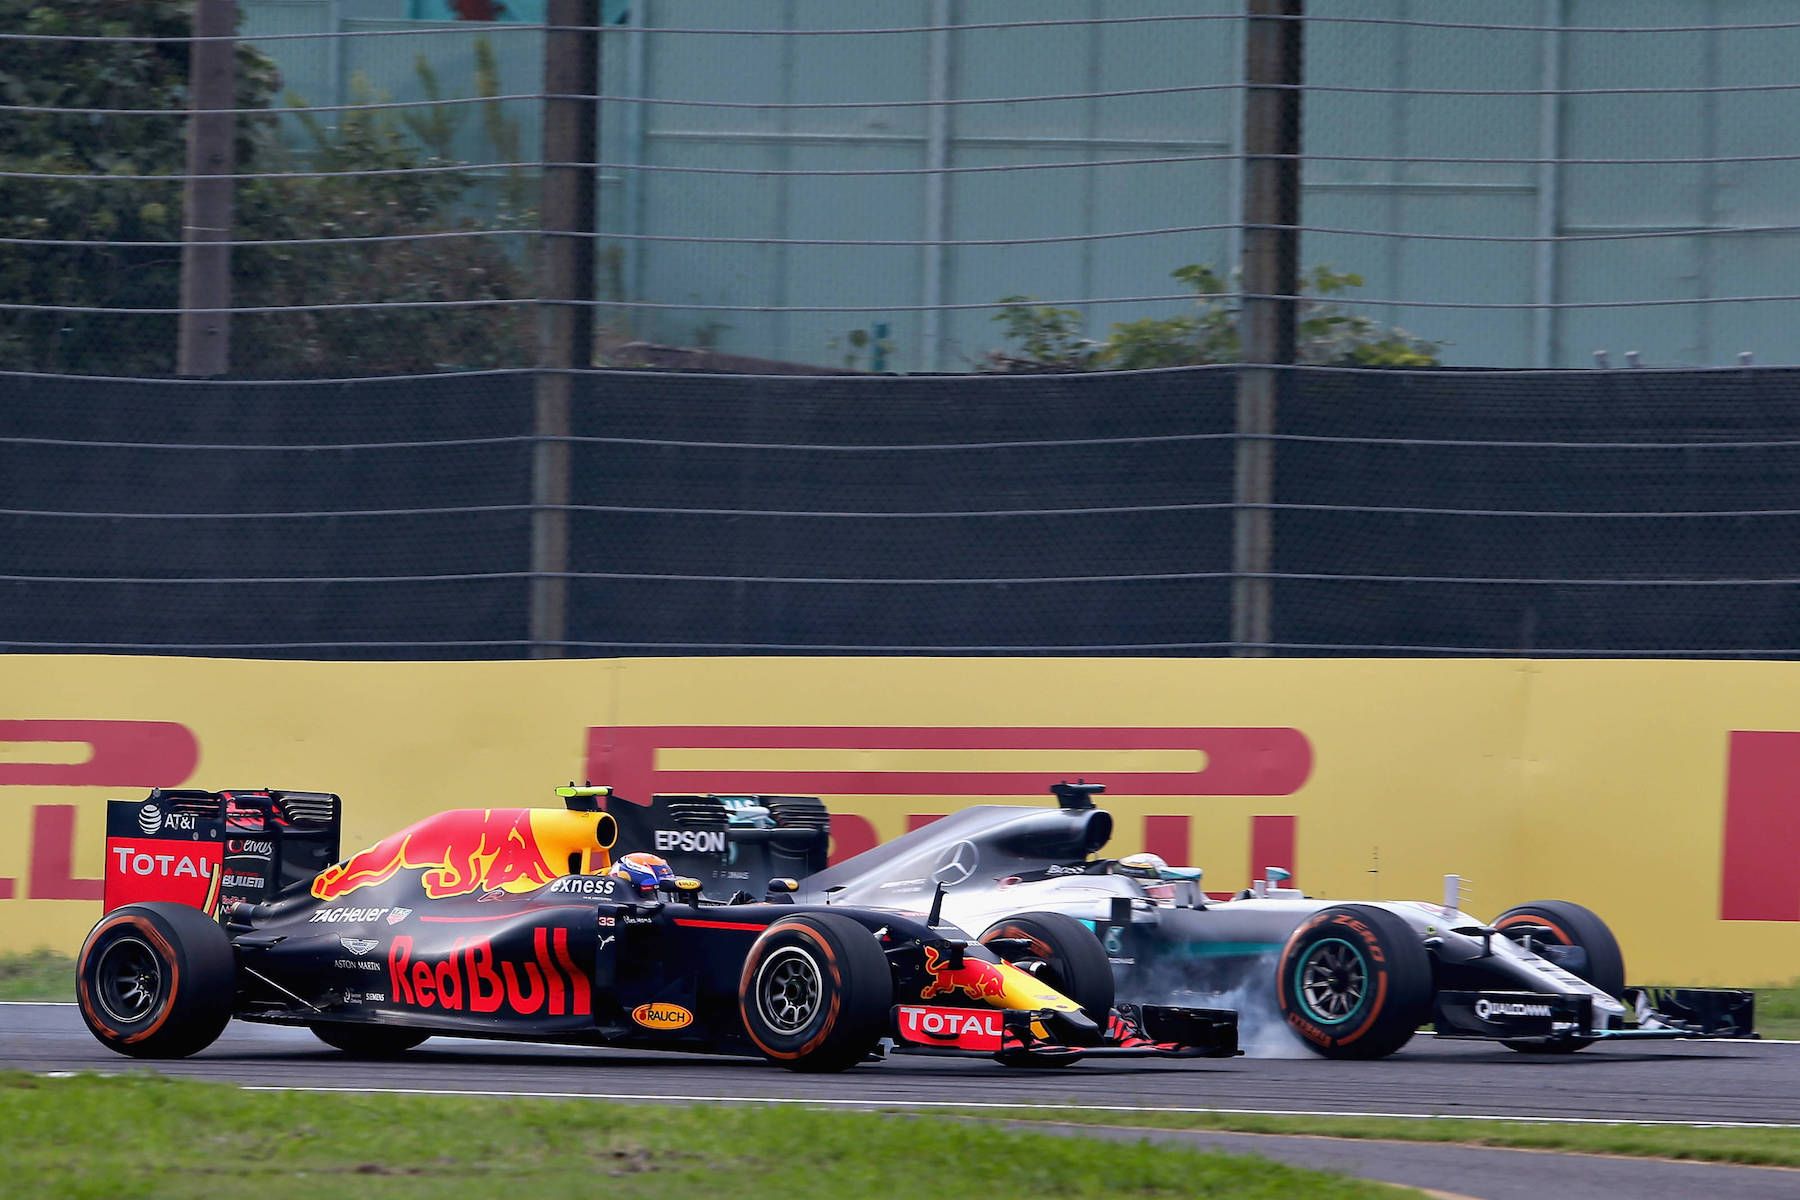 Salracing - Max Verstappen and Lewis Hamilton